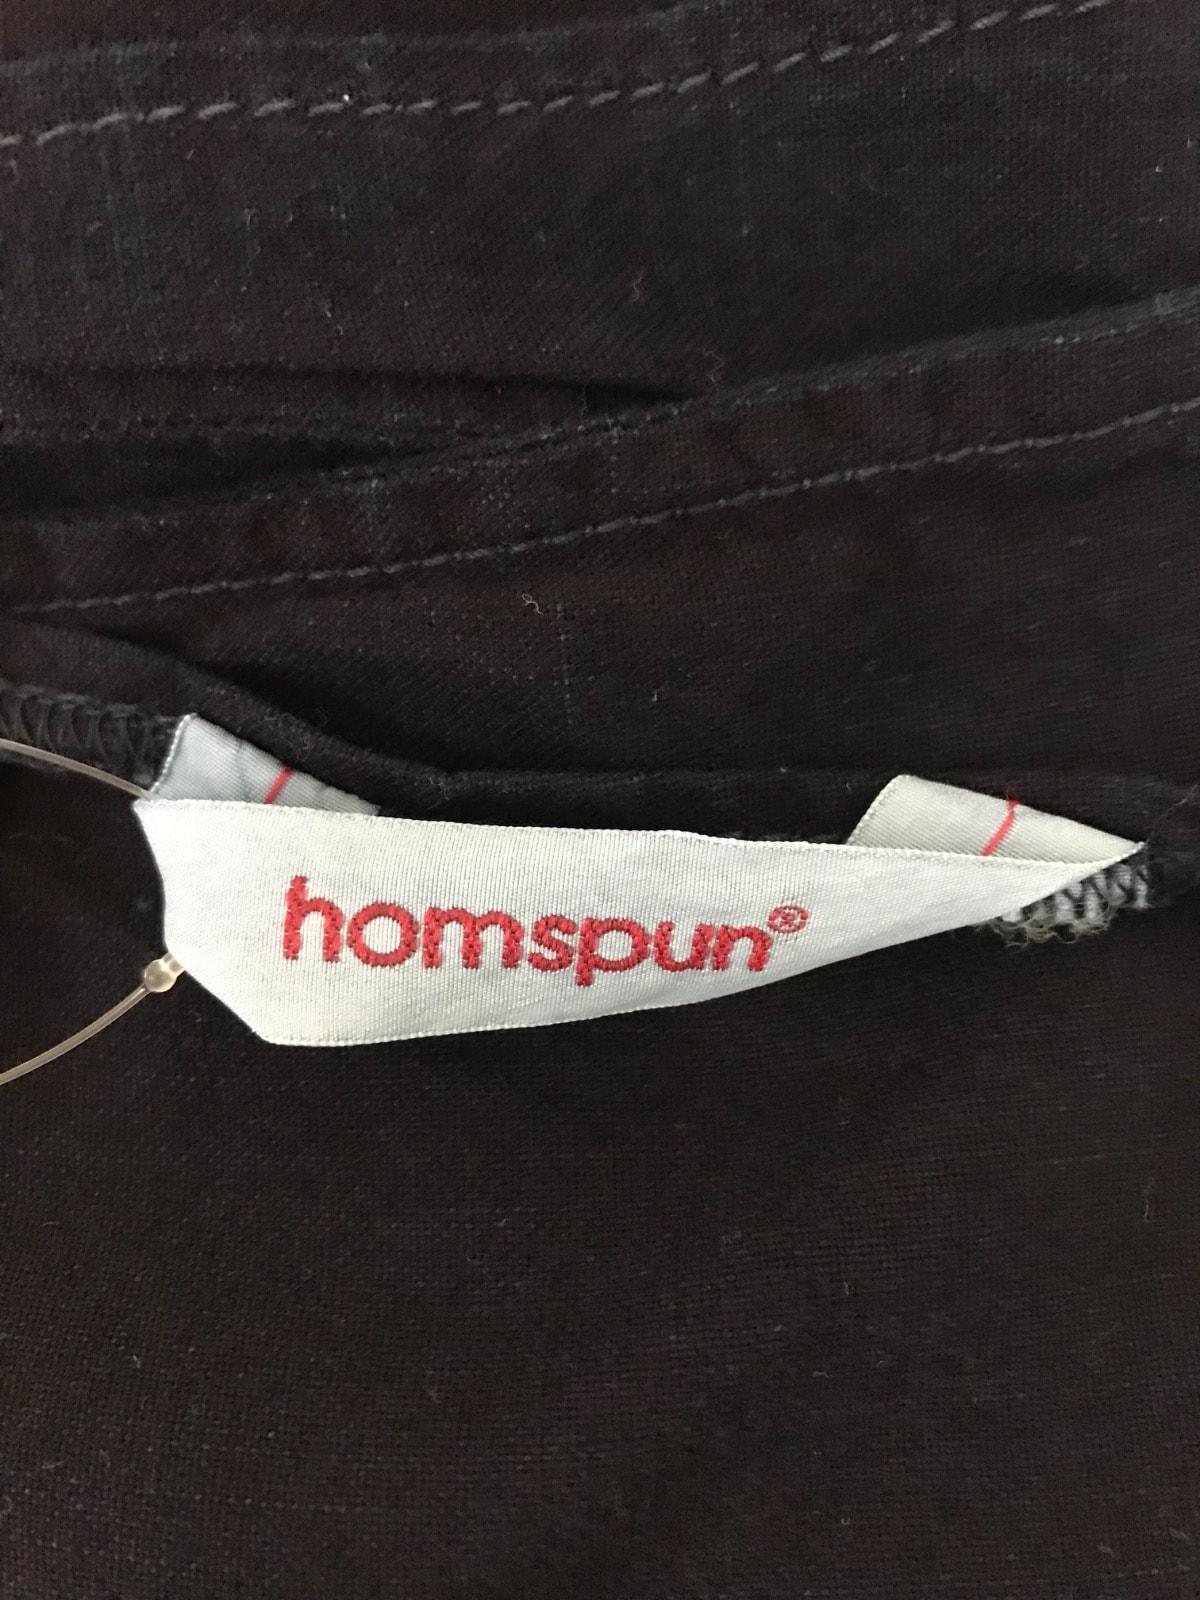 homspun(ホームスパン)のワンピース